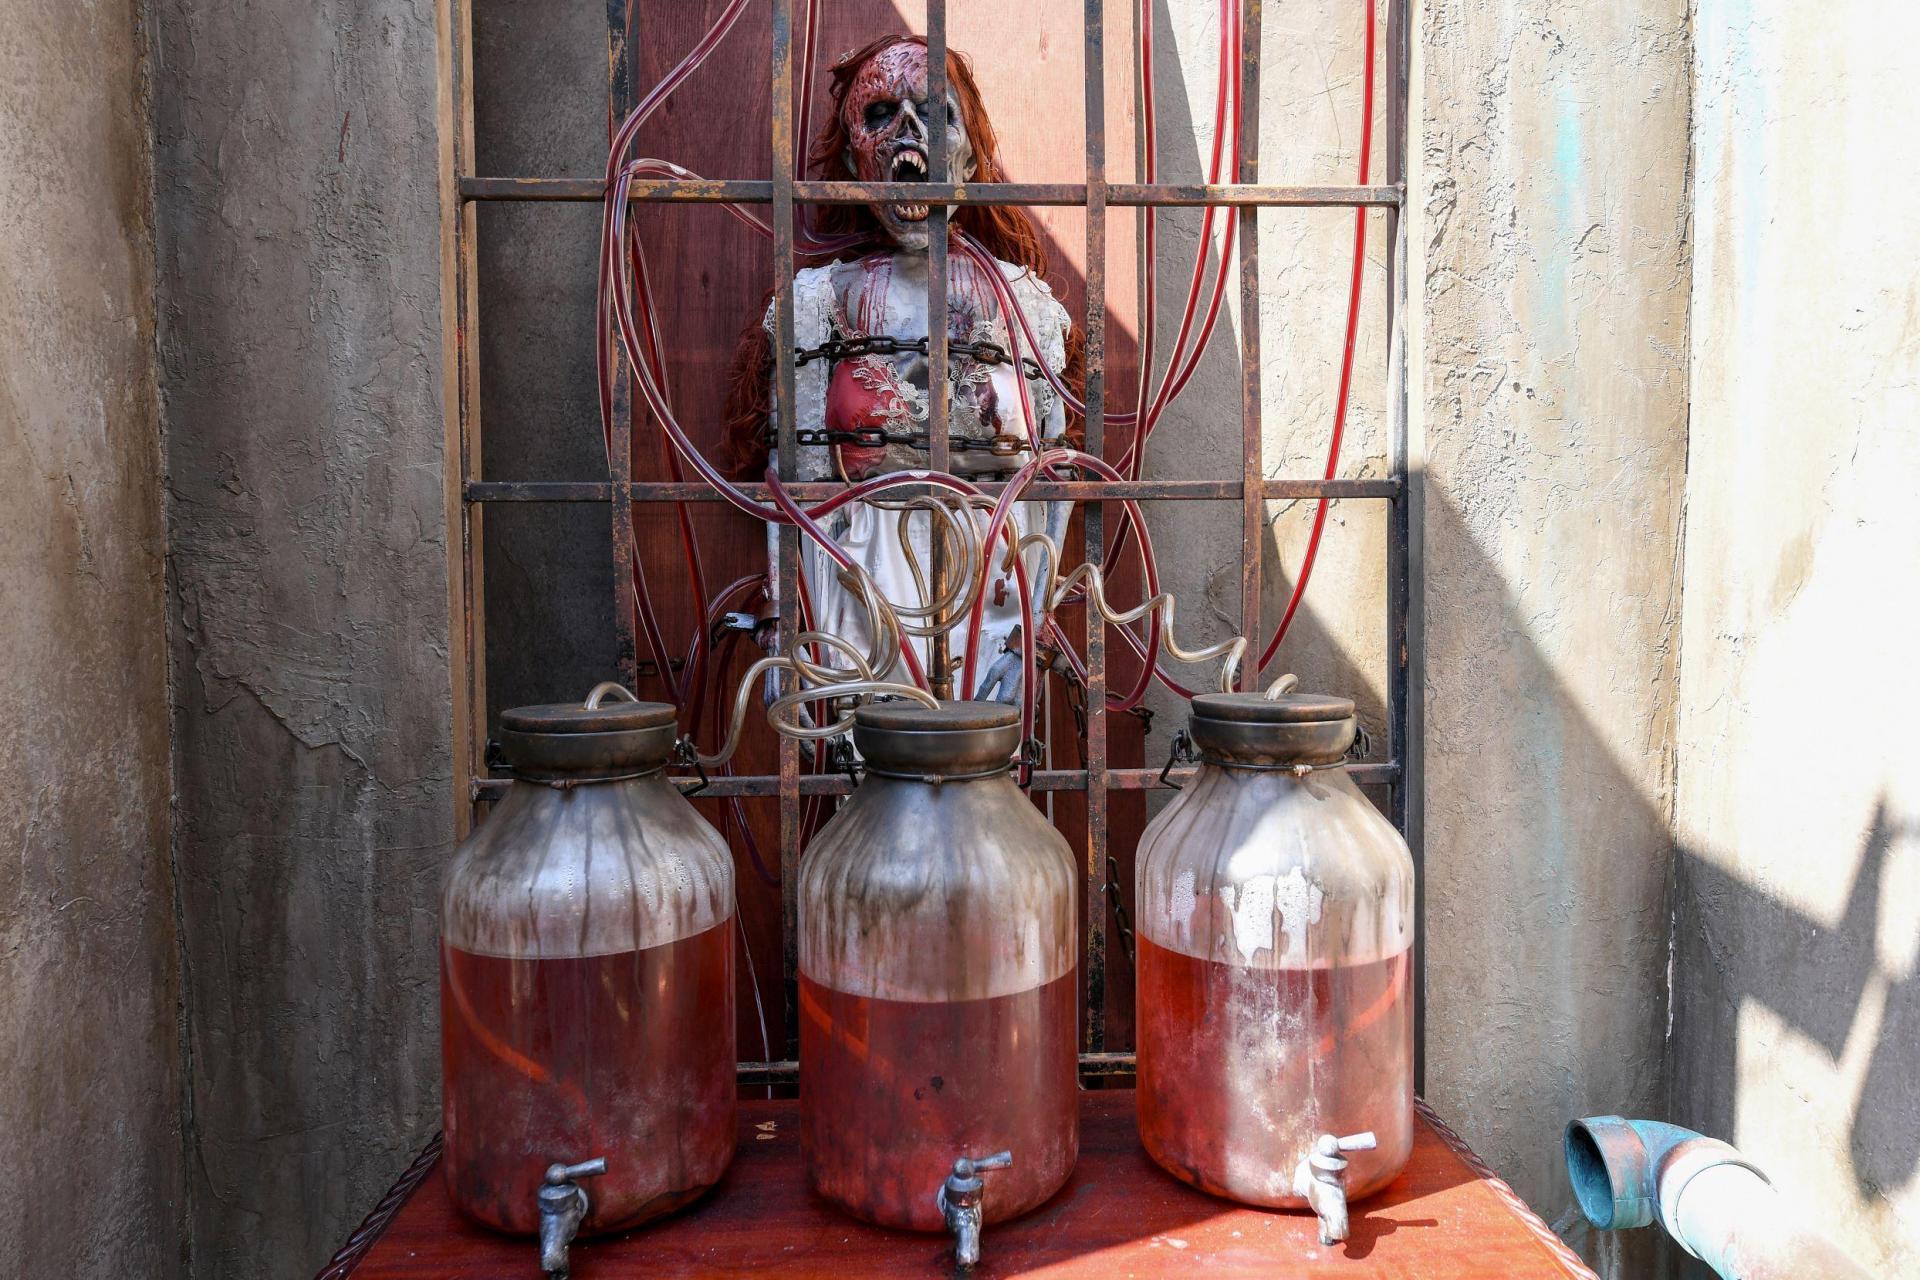 Jars of blood are seen part of 'The Bride of Frankenstein' maze.